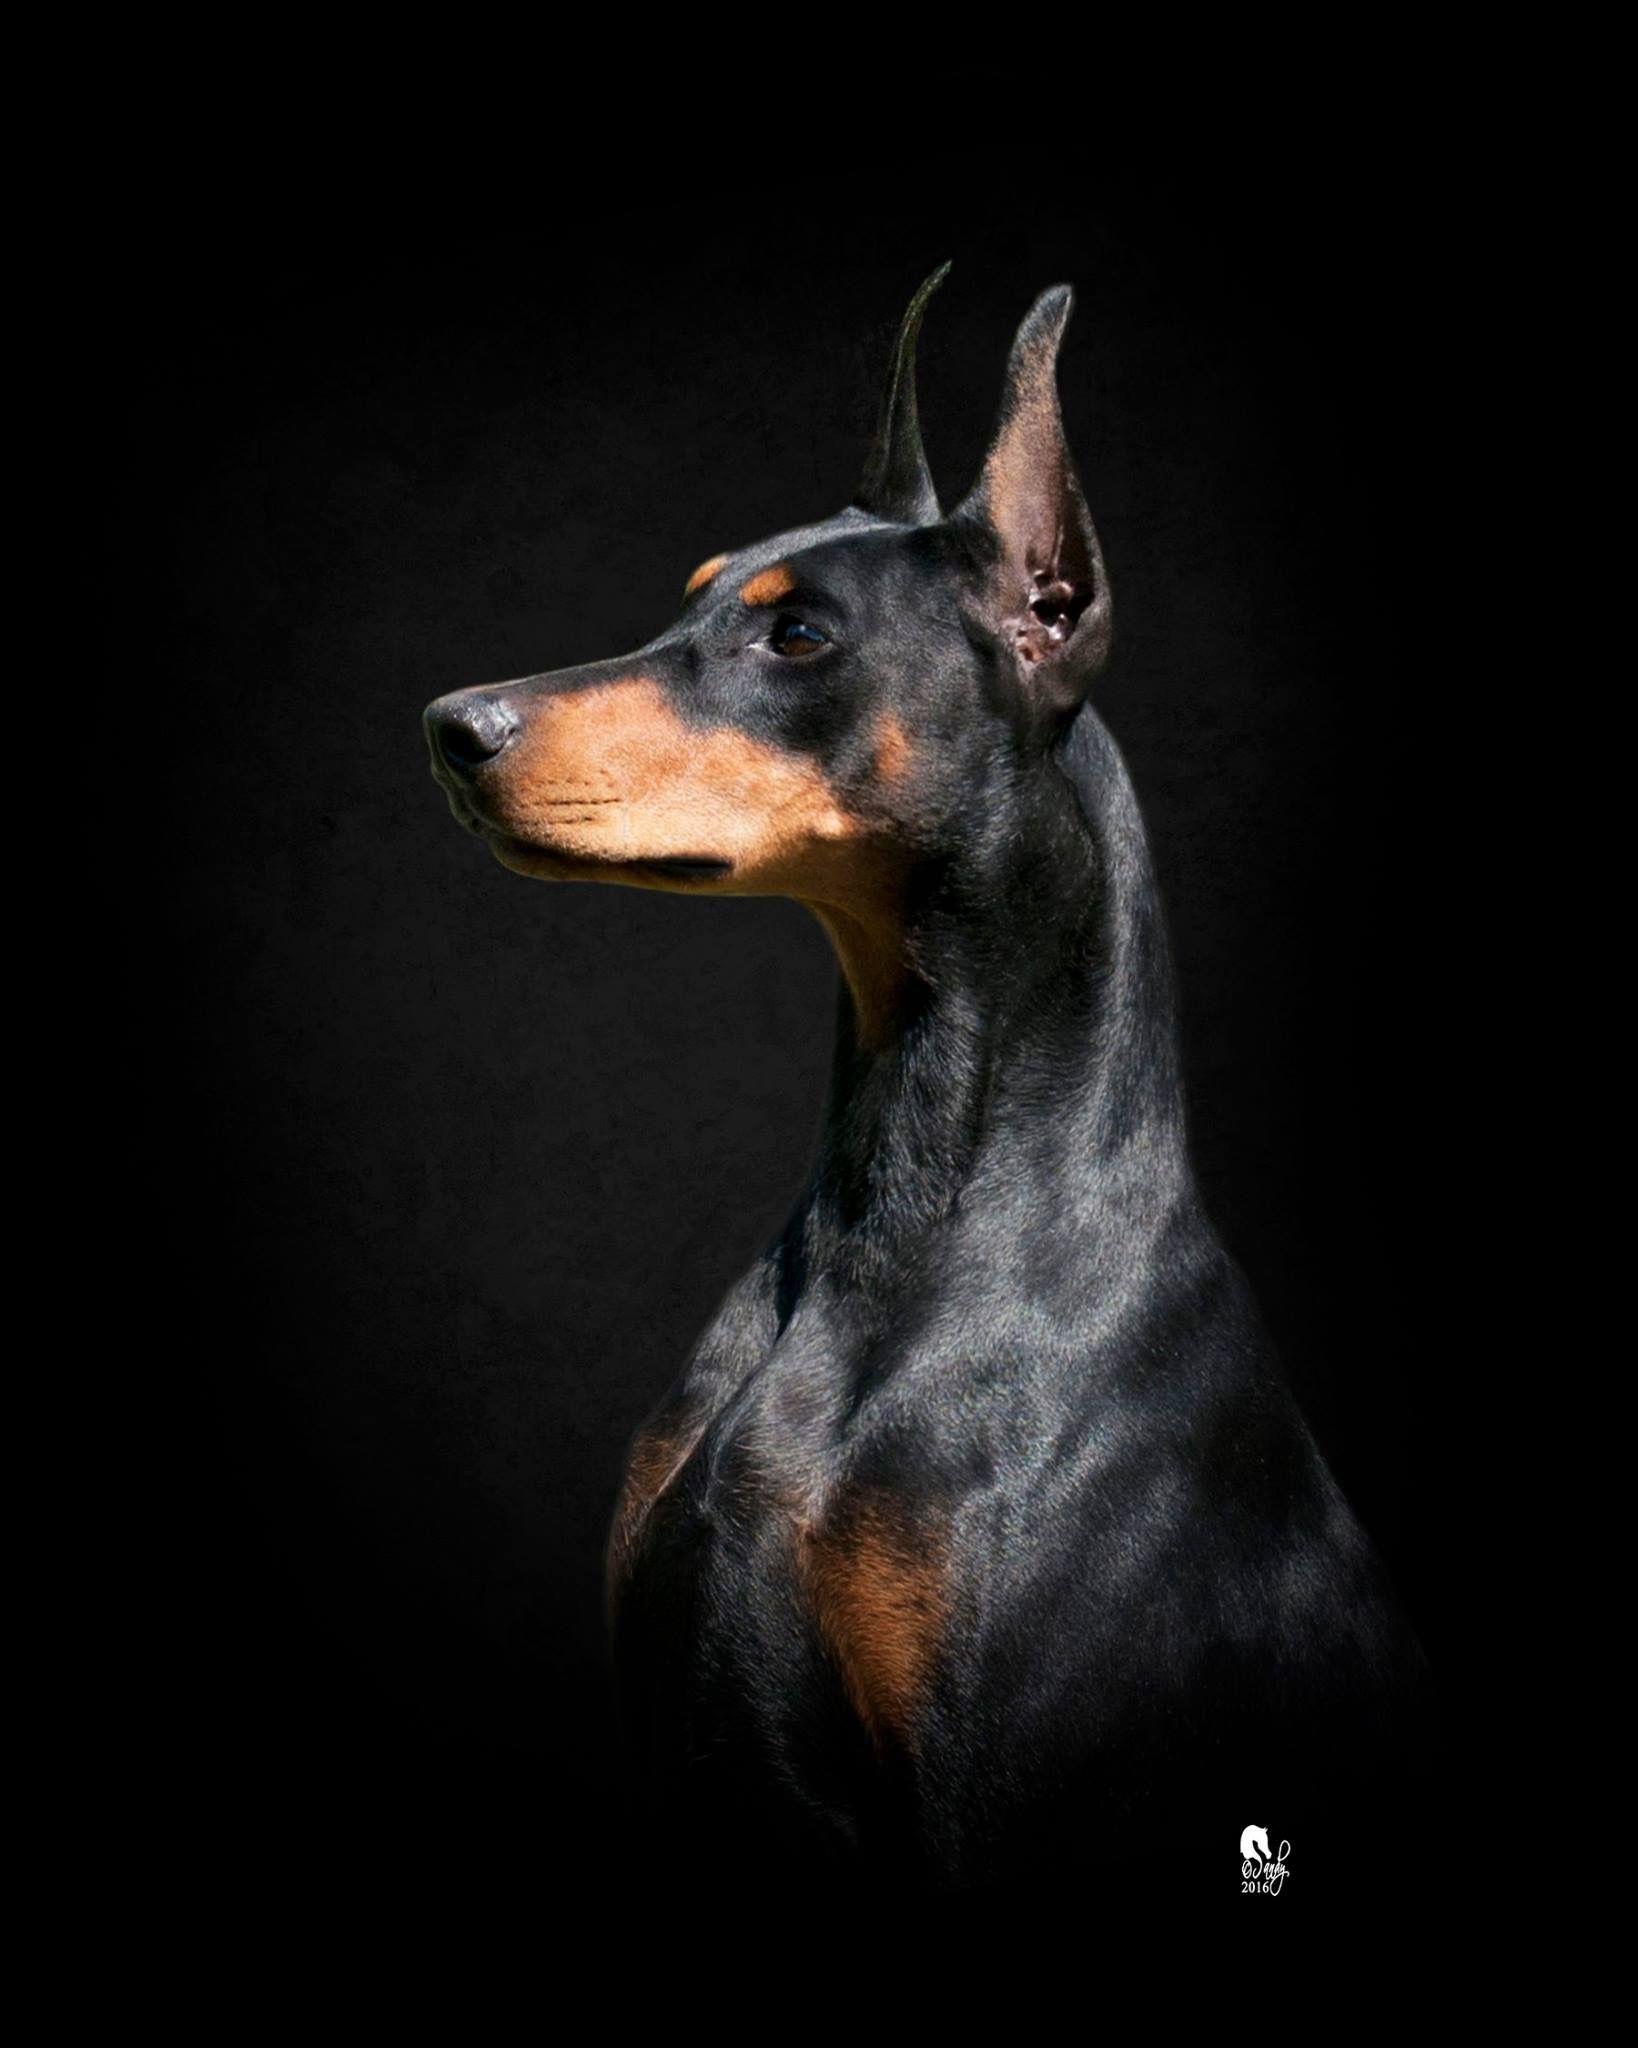 Pin By Anne Marie Barger On Dobies Doberman Dogs Doberman Pinscher Dog Doberman Doberman dog hd wallpaper